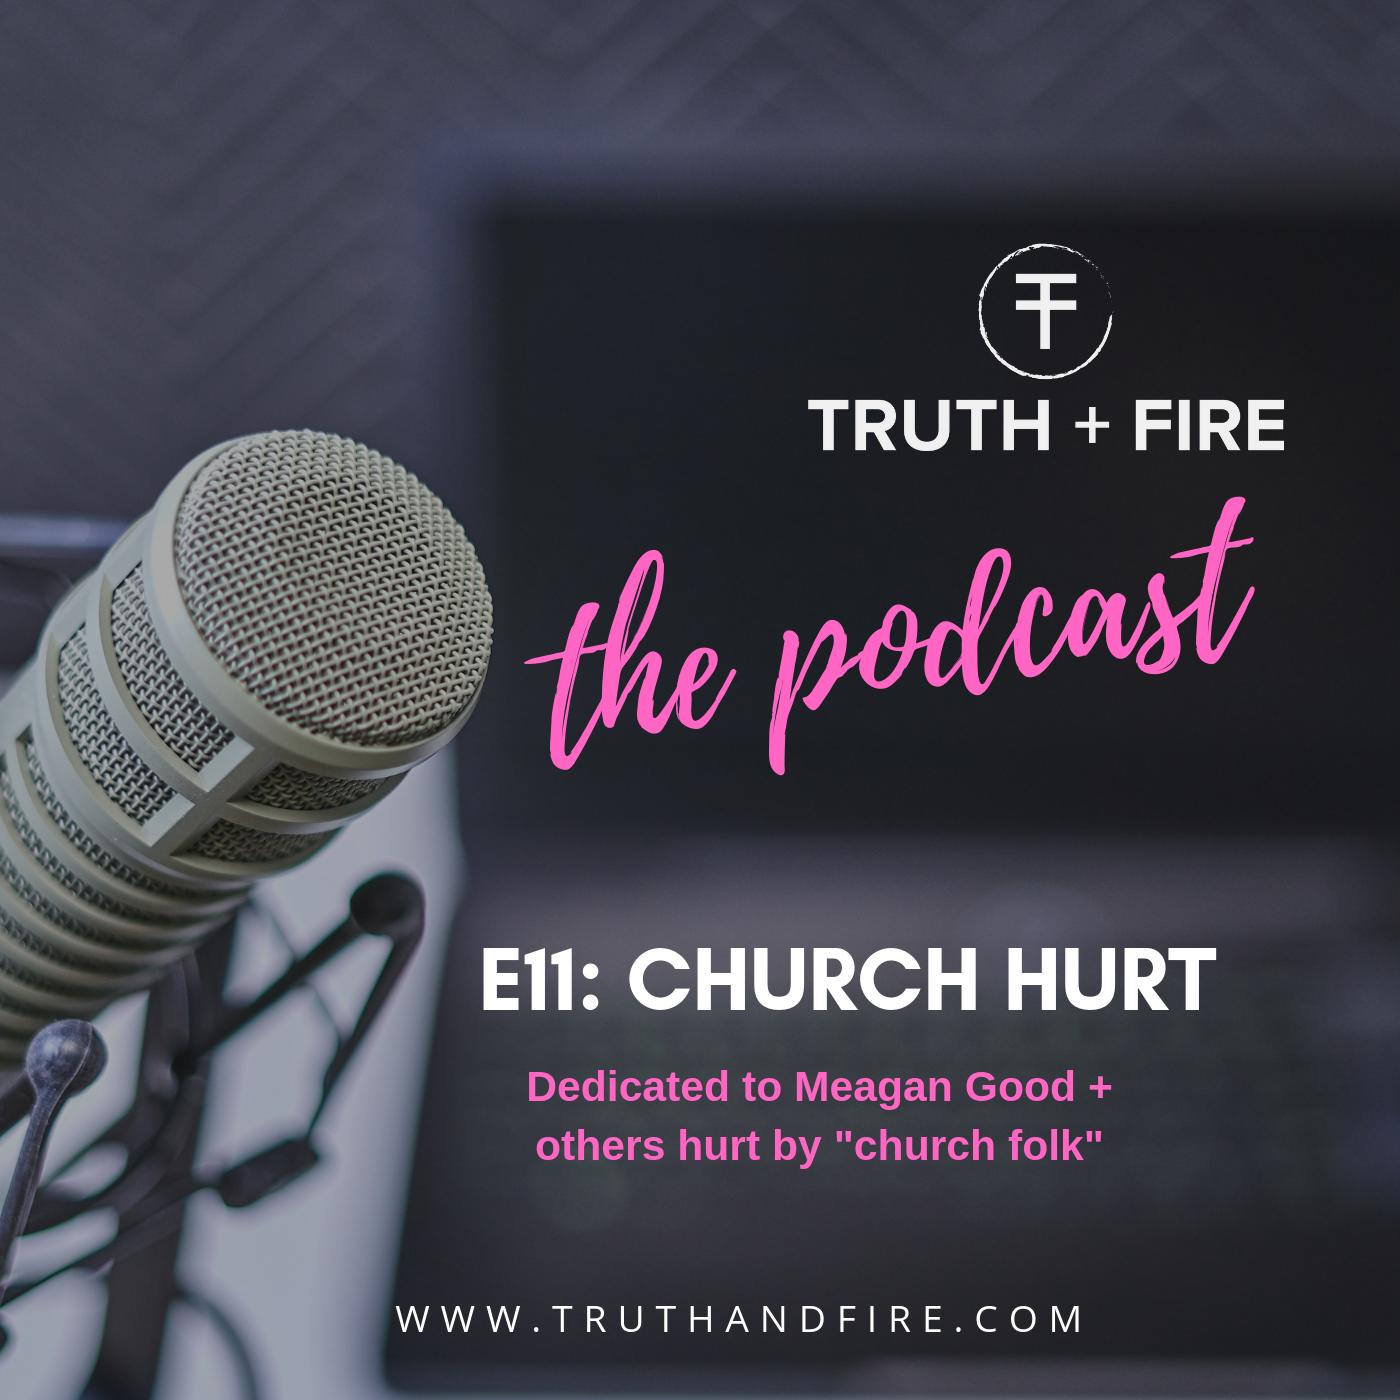 E11: Church Hurt: Dedicated to Meagan Good + Others Hurt by 'Church Folk'